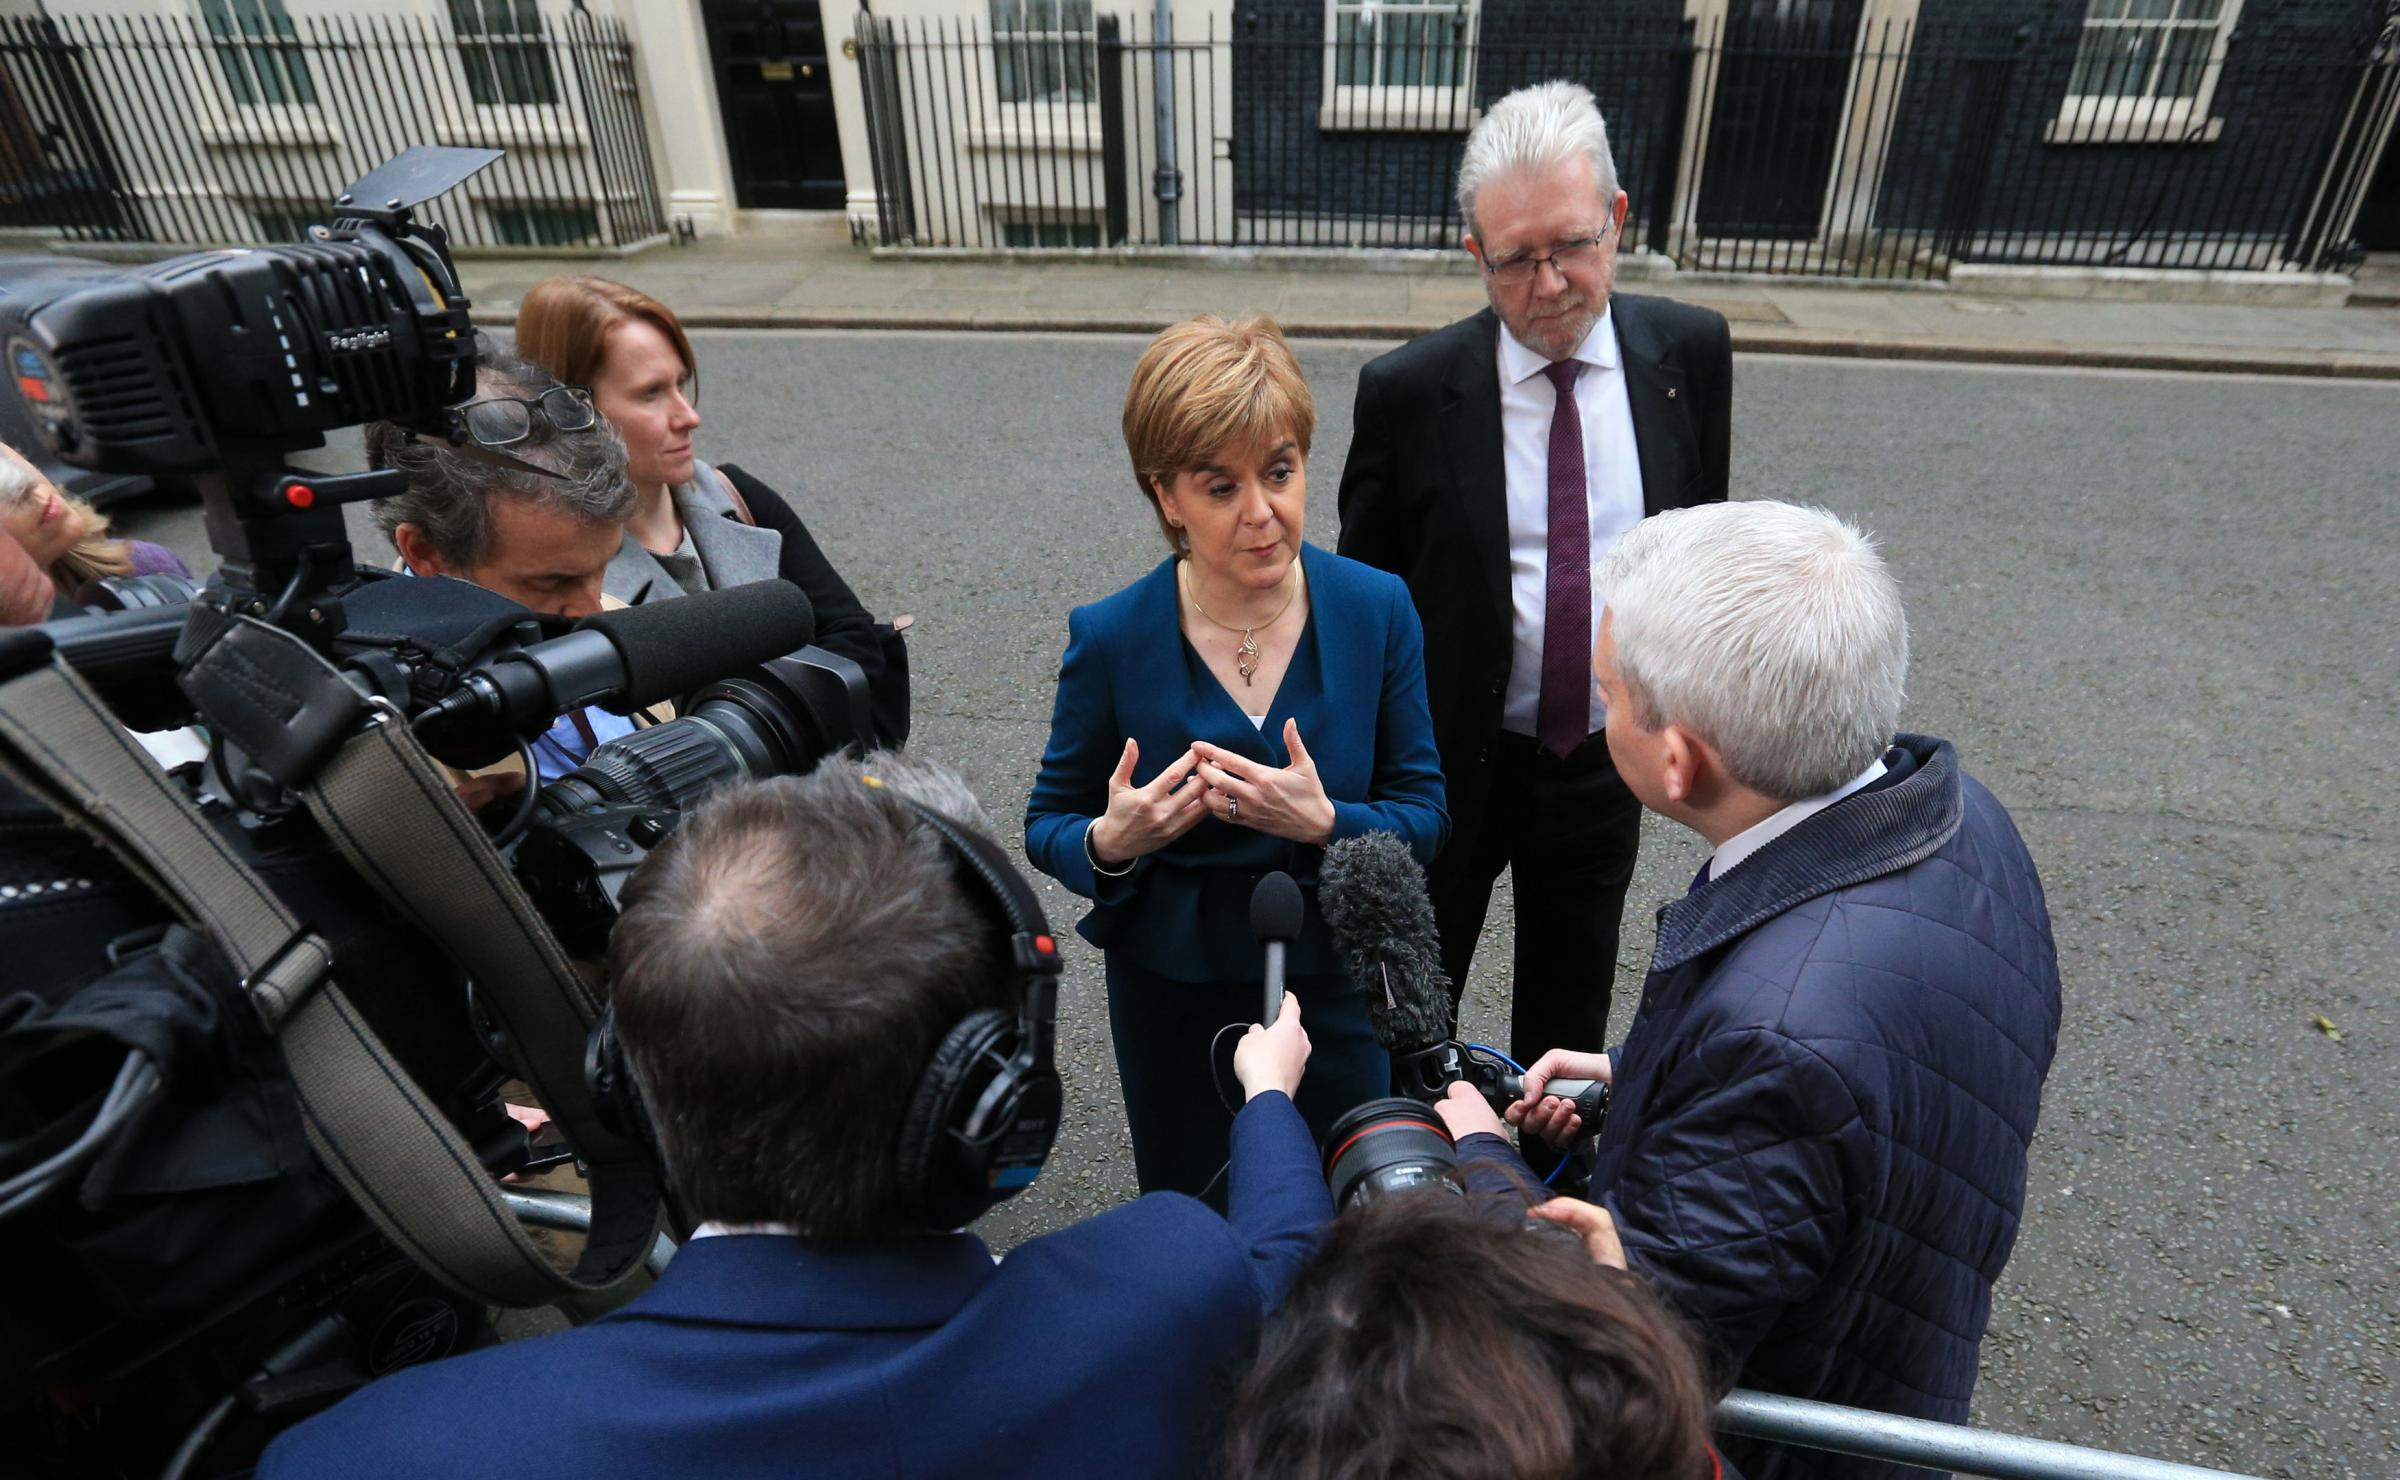 British banks preparing to leave UK over Brexit